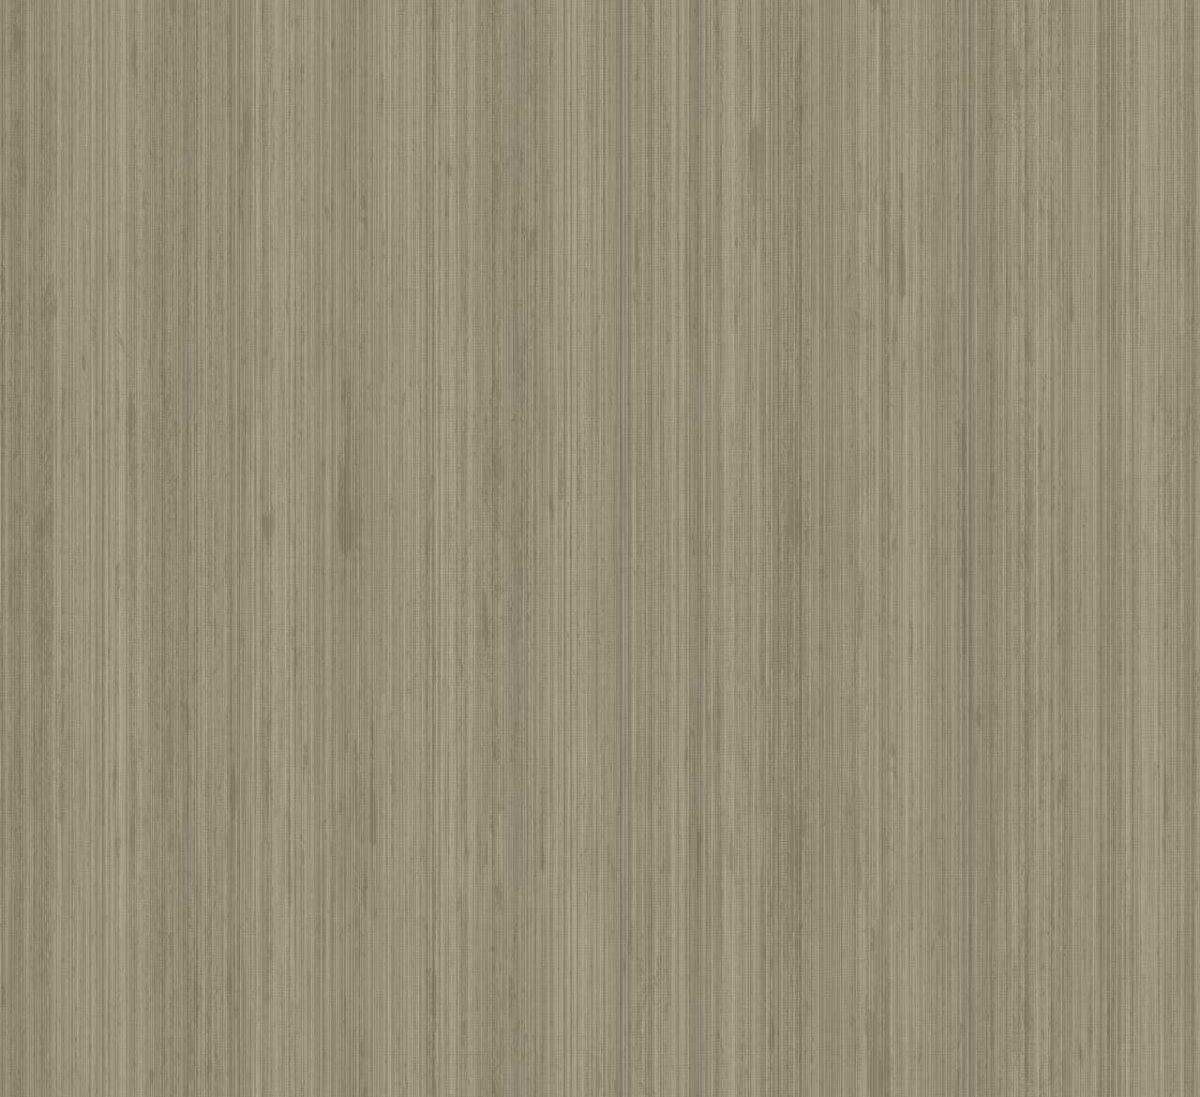 Capri-Luxury-Wallpaper-CP00736-Silk-Texture